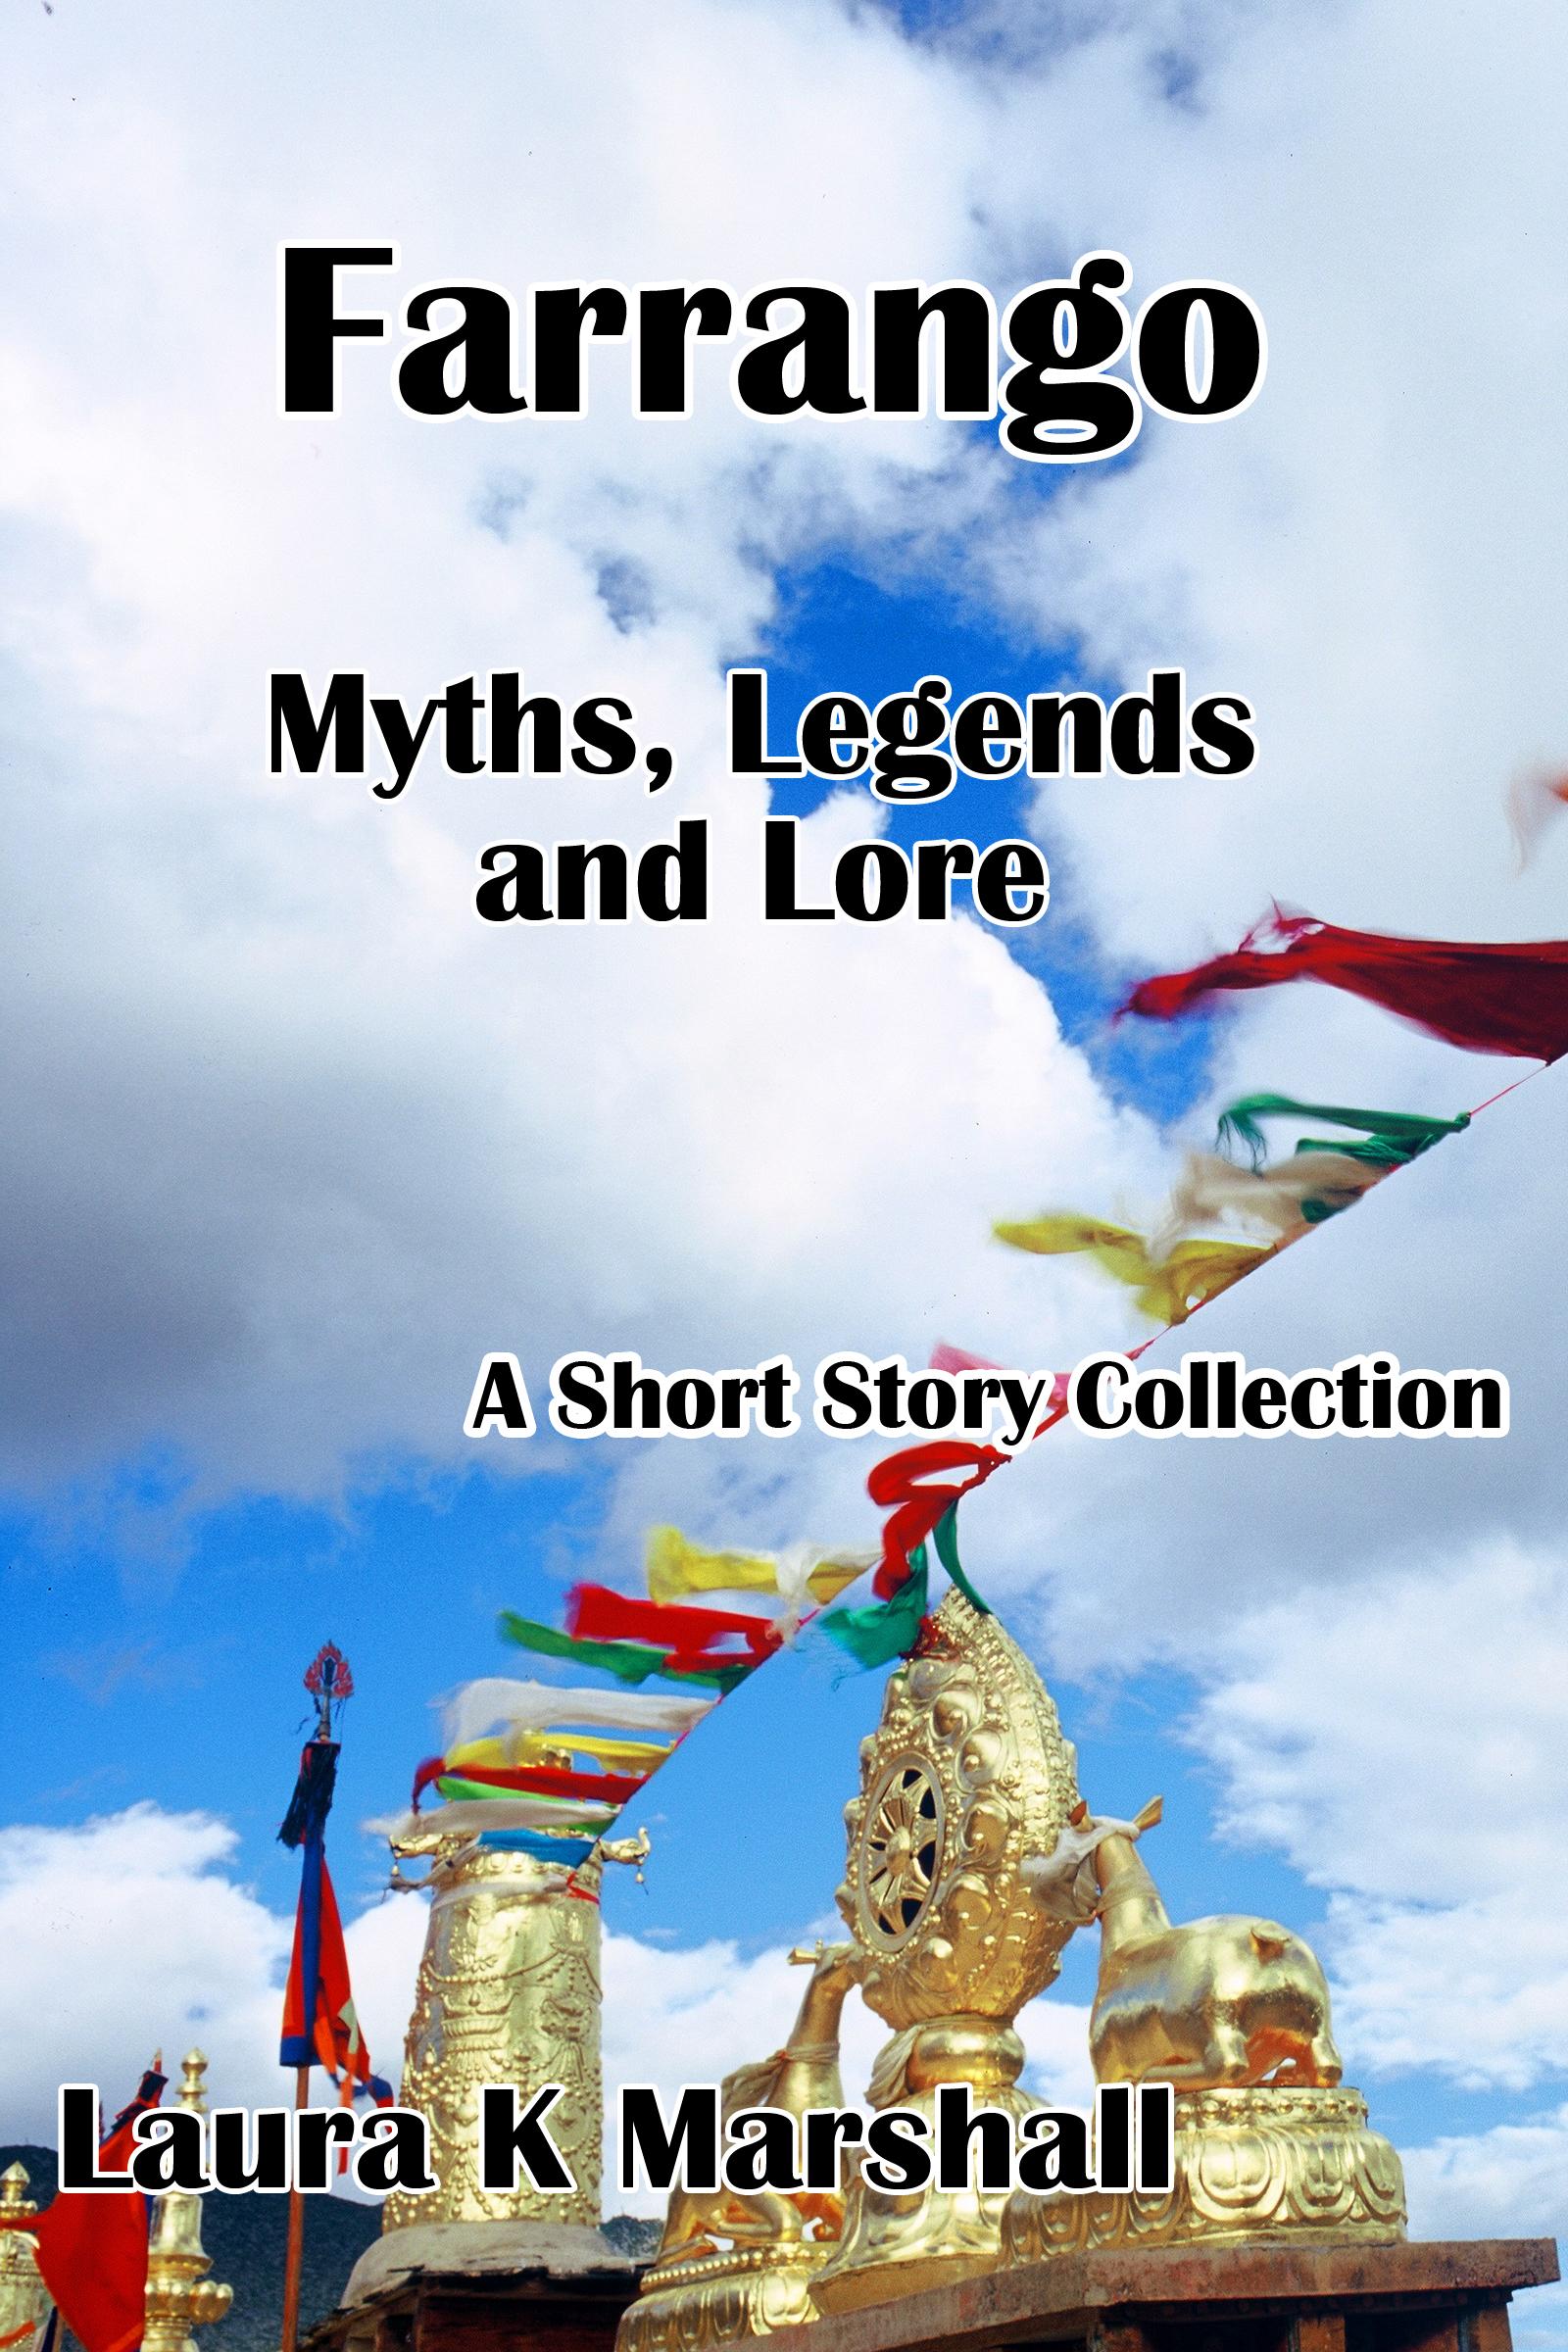 Farrango - Myths, Legends and Lore